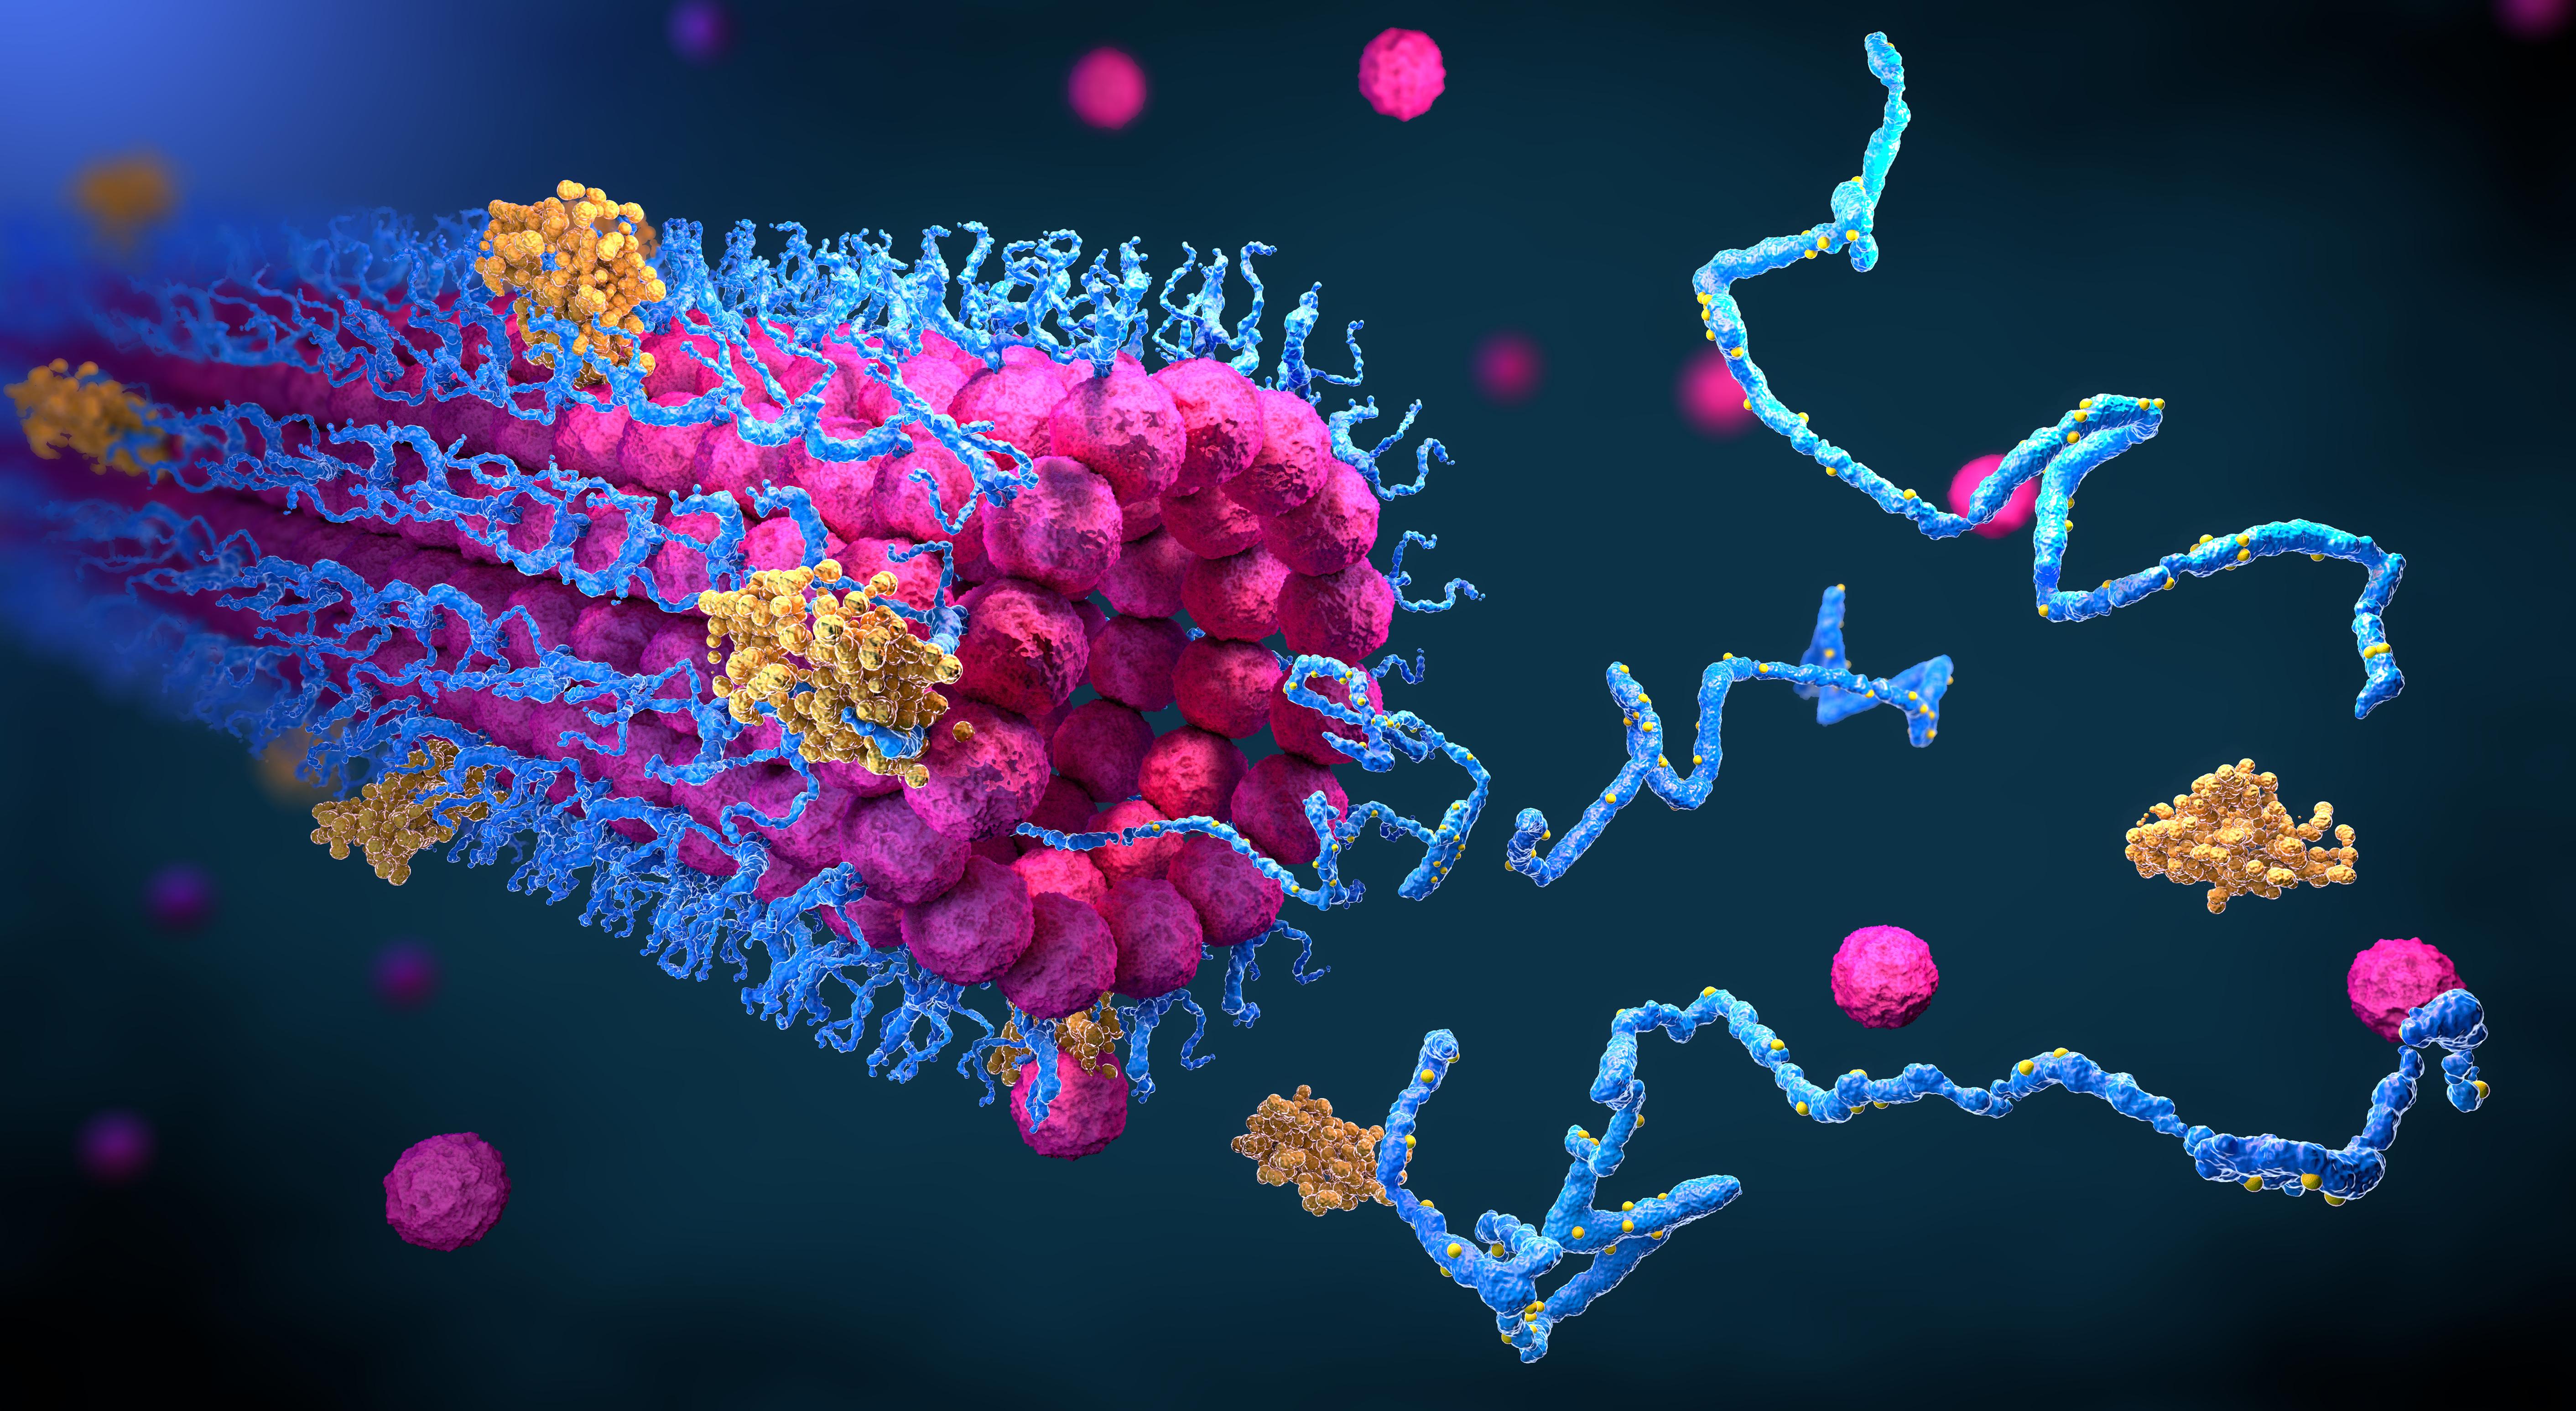 techcrunch.com - Emma Betuel - Shares of protein discovery platform Absci pop in market debut